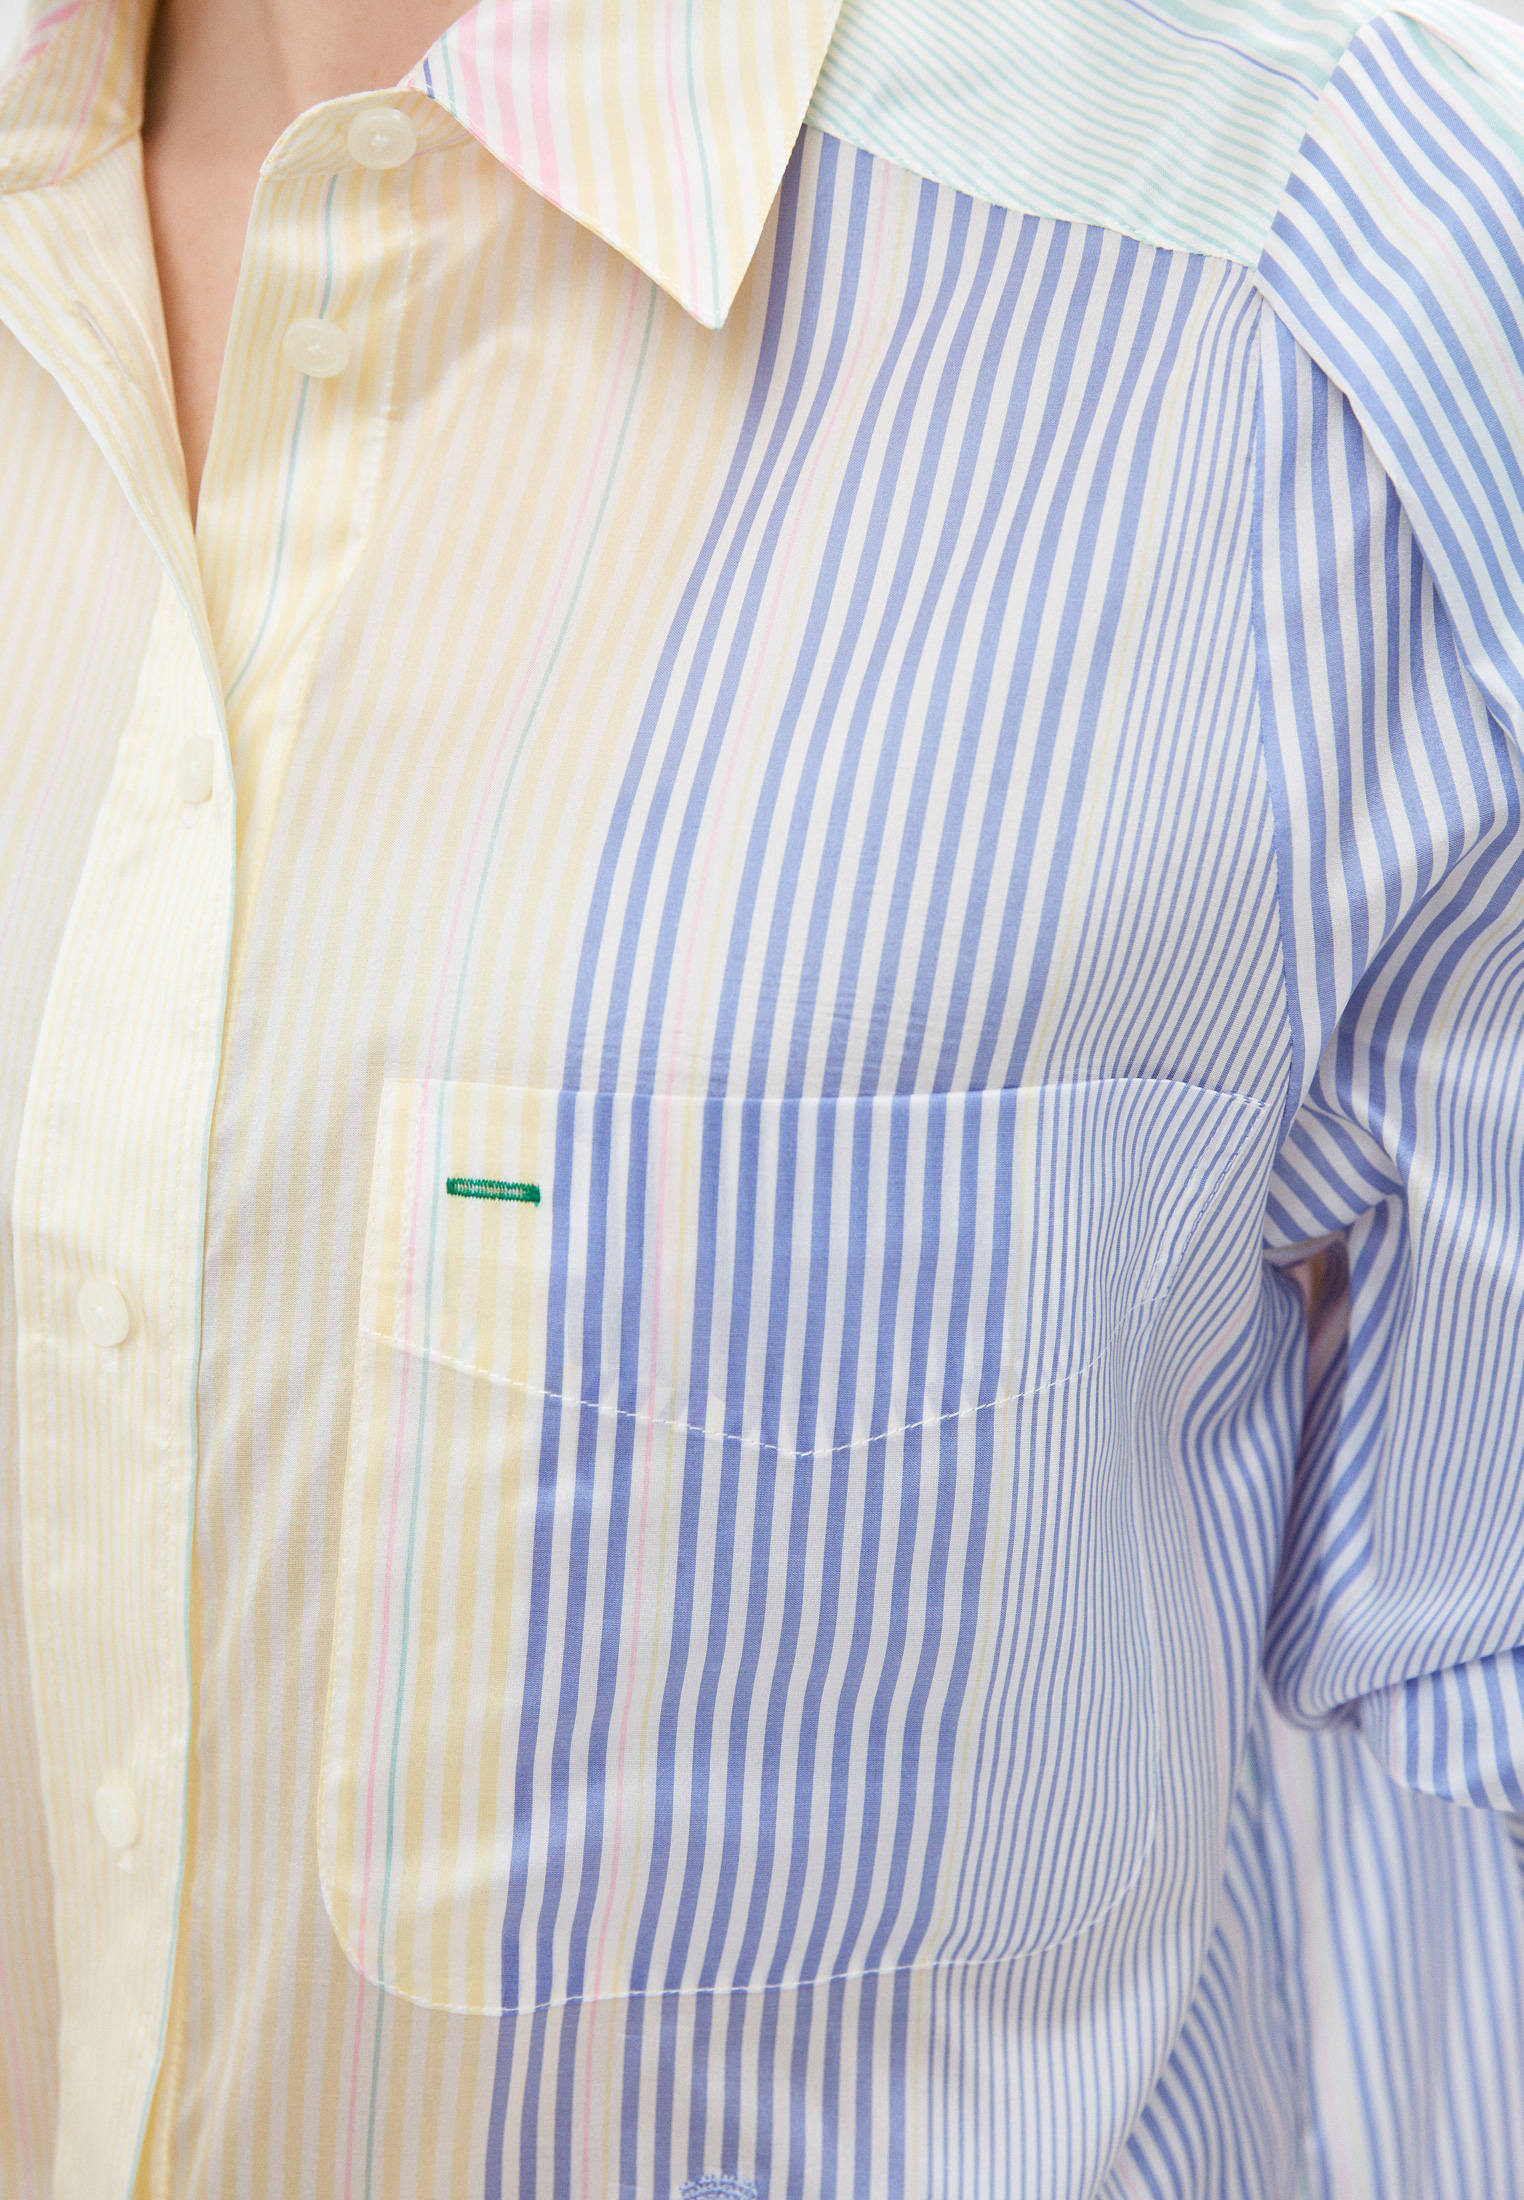 Блуза Tommy Hilfiger (Томми Хилфигер) WW0WW30936: изображение 4